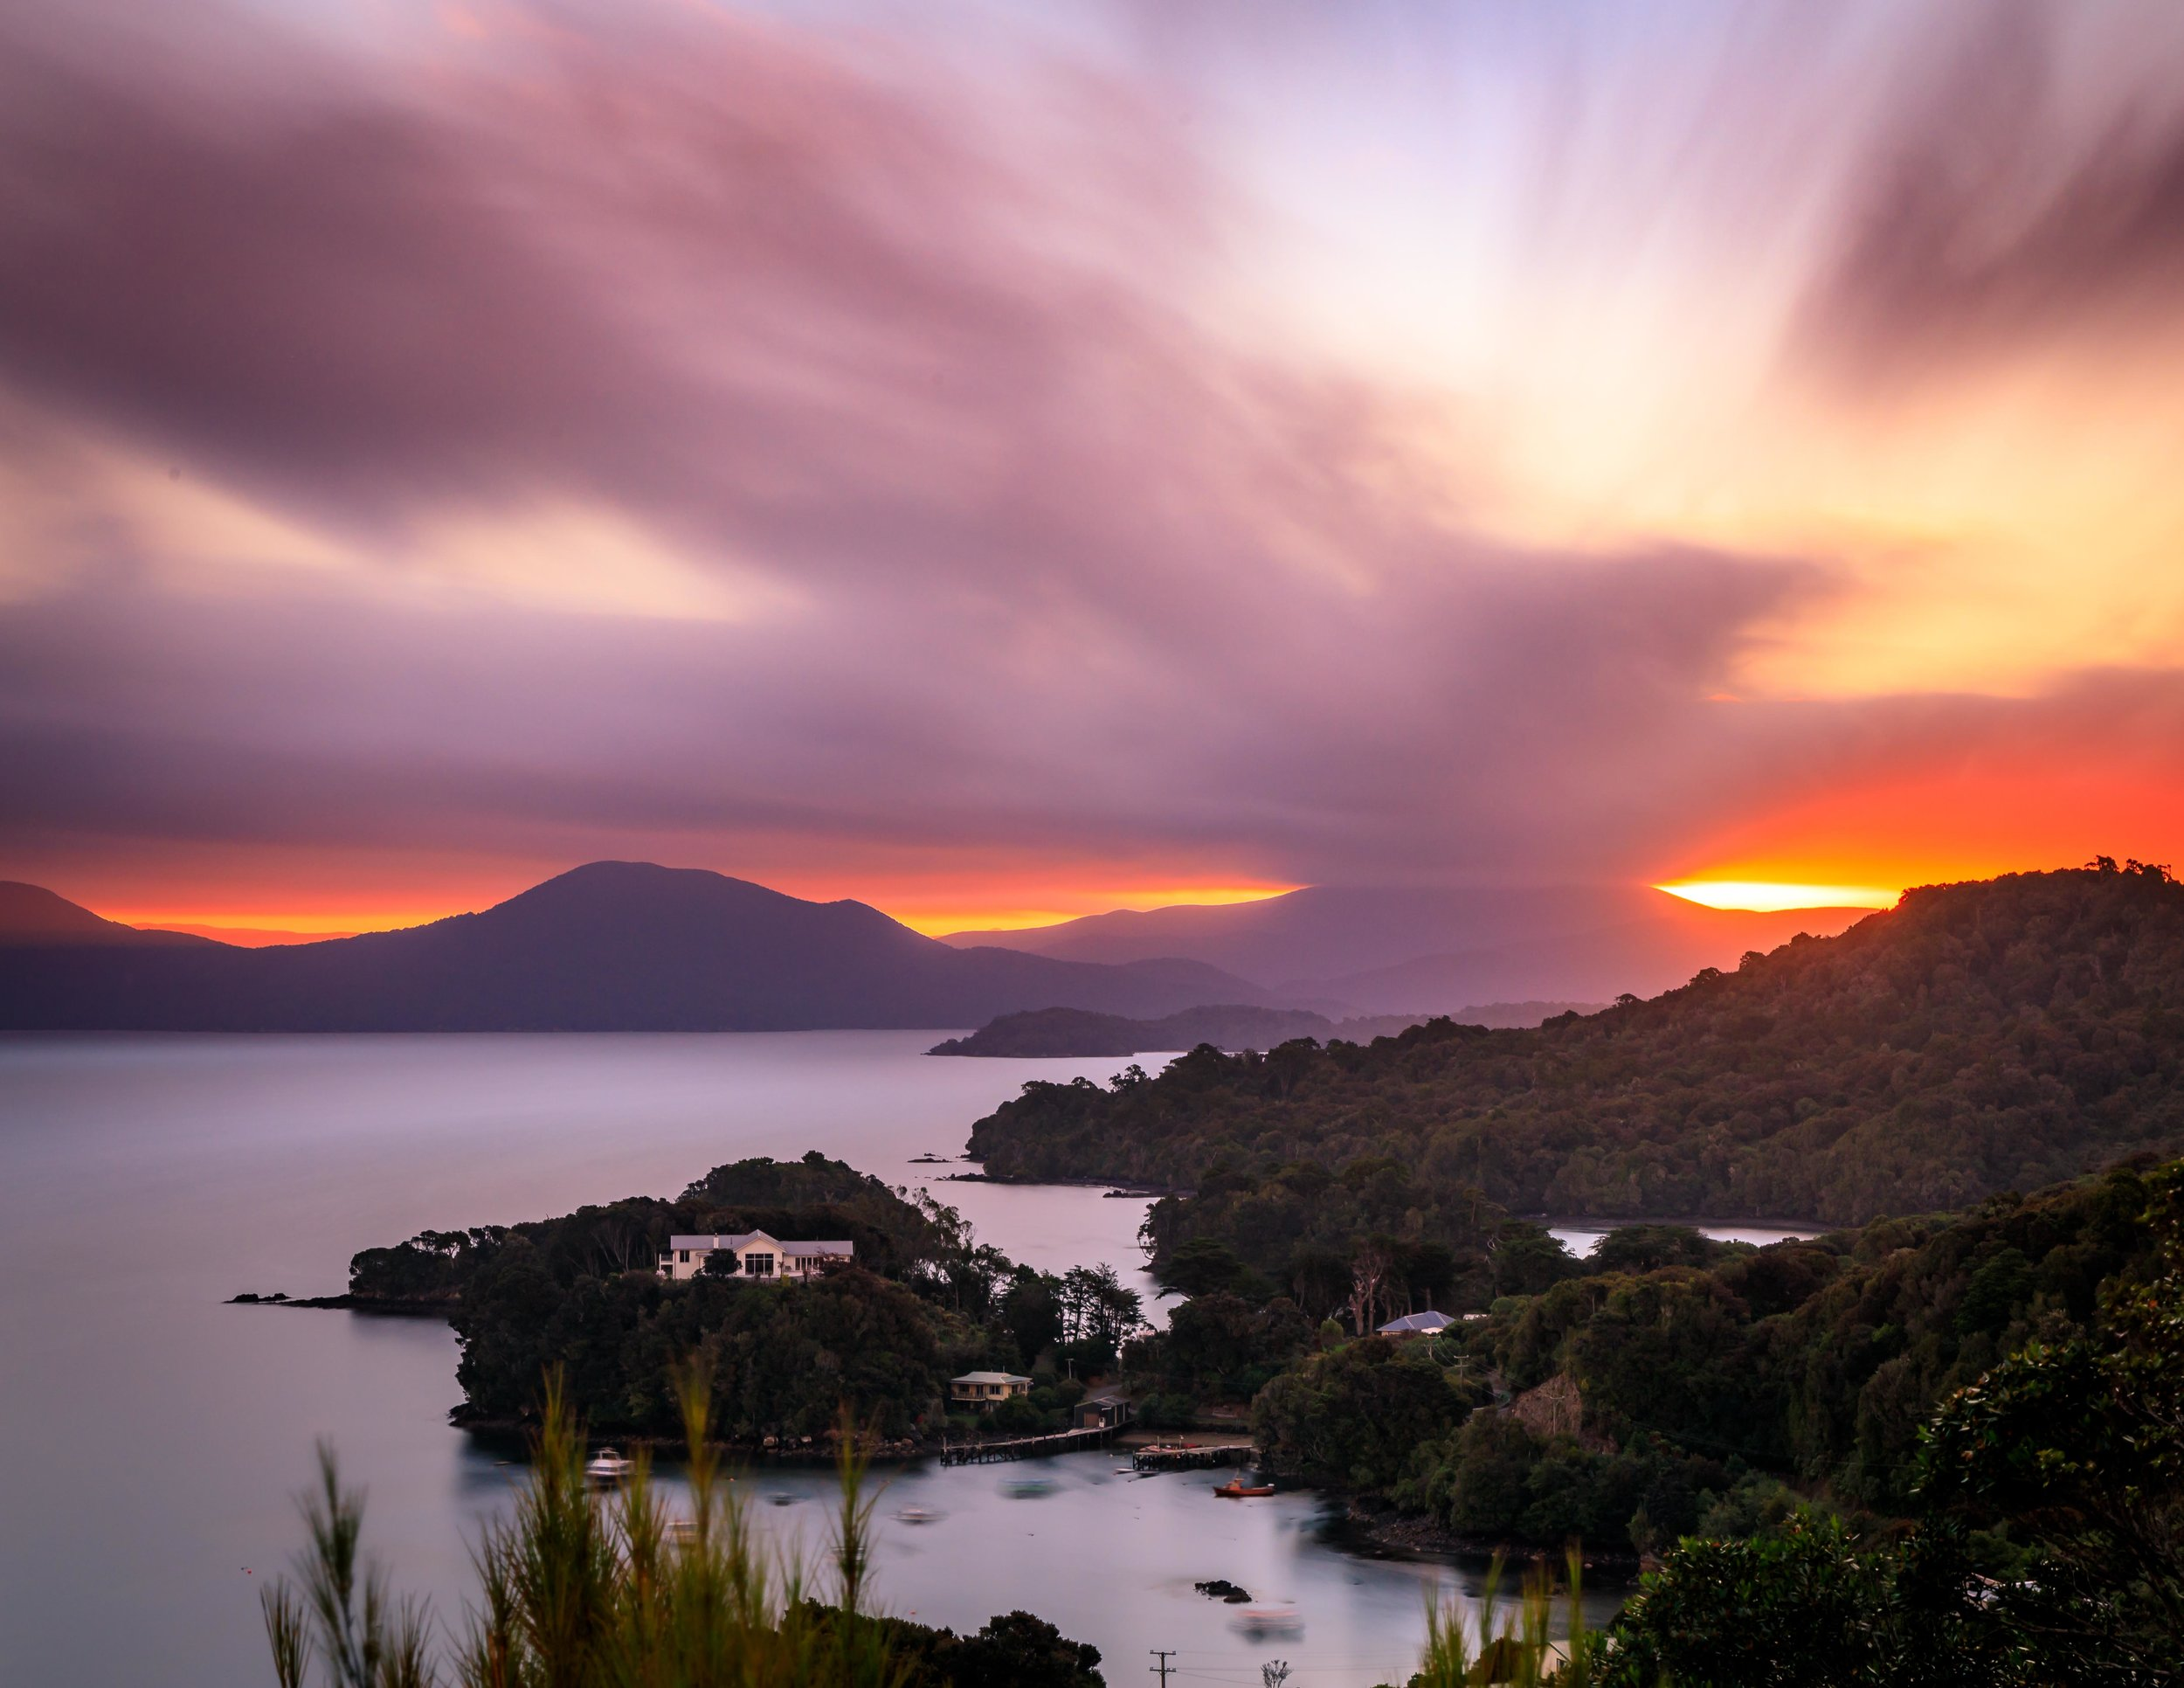 Sunset at Observation Rock, Stewart Island